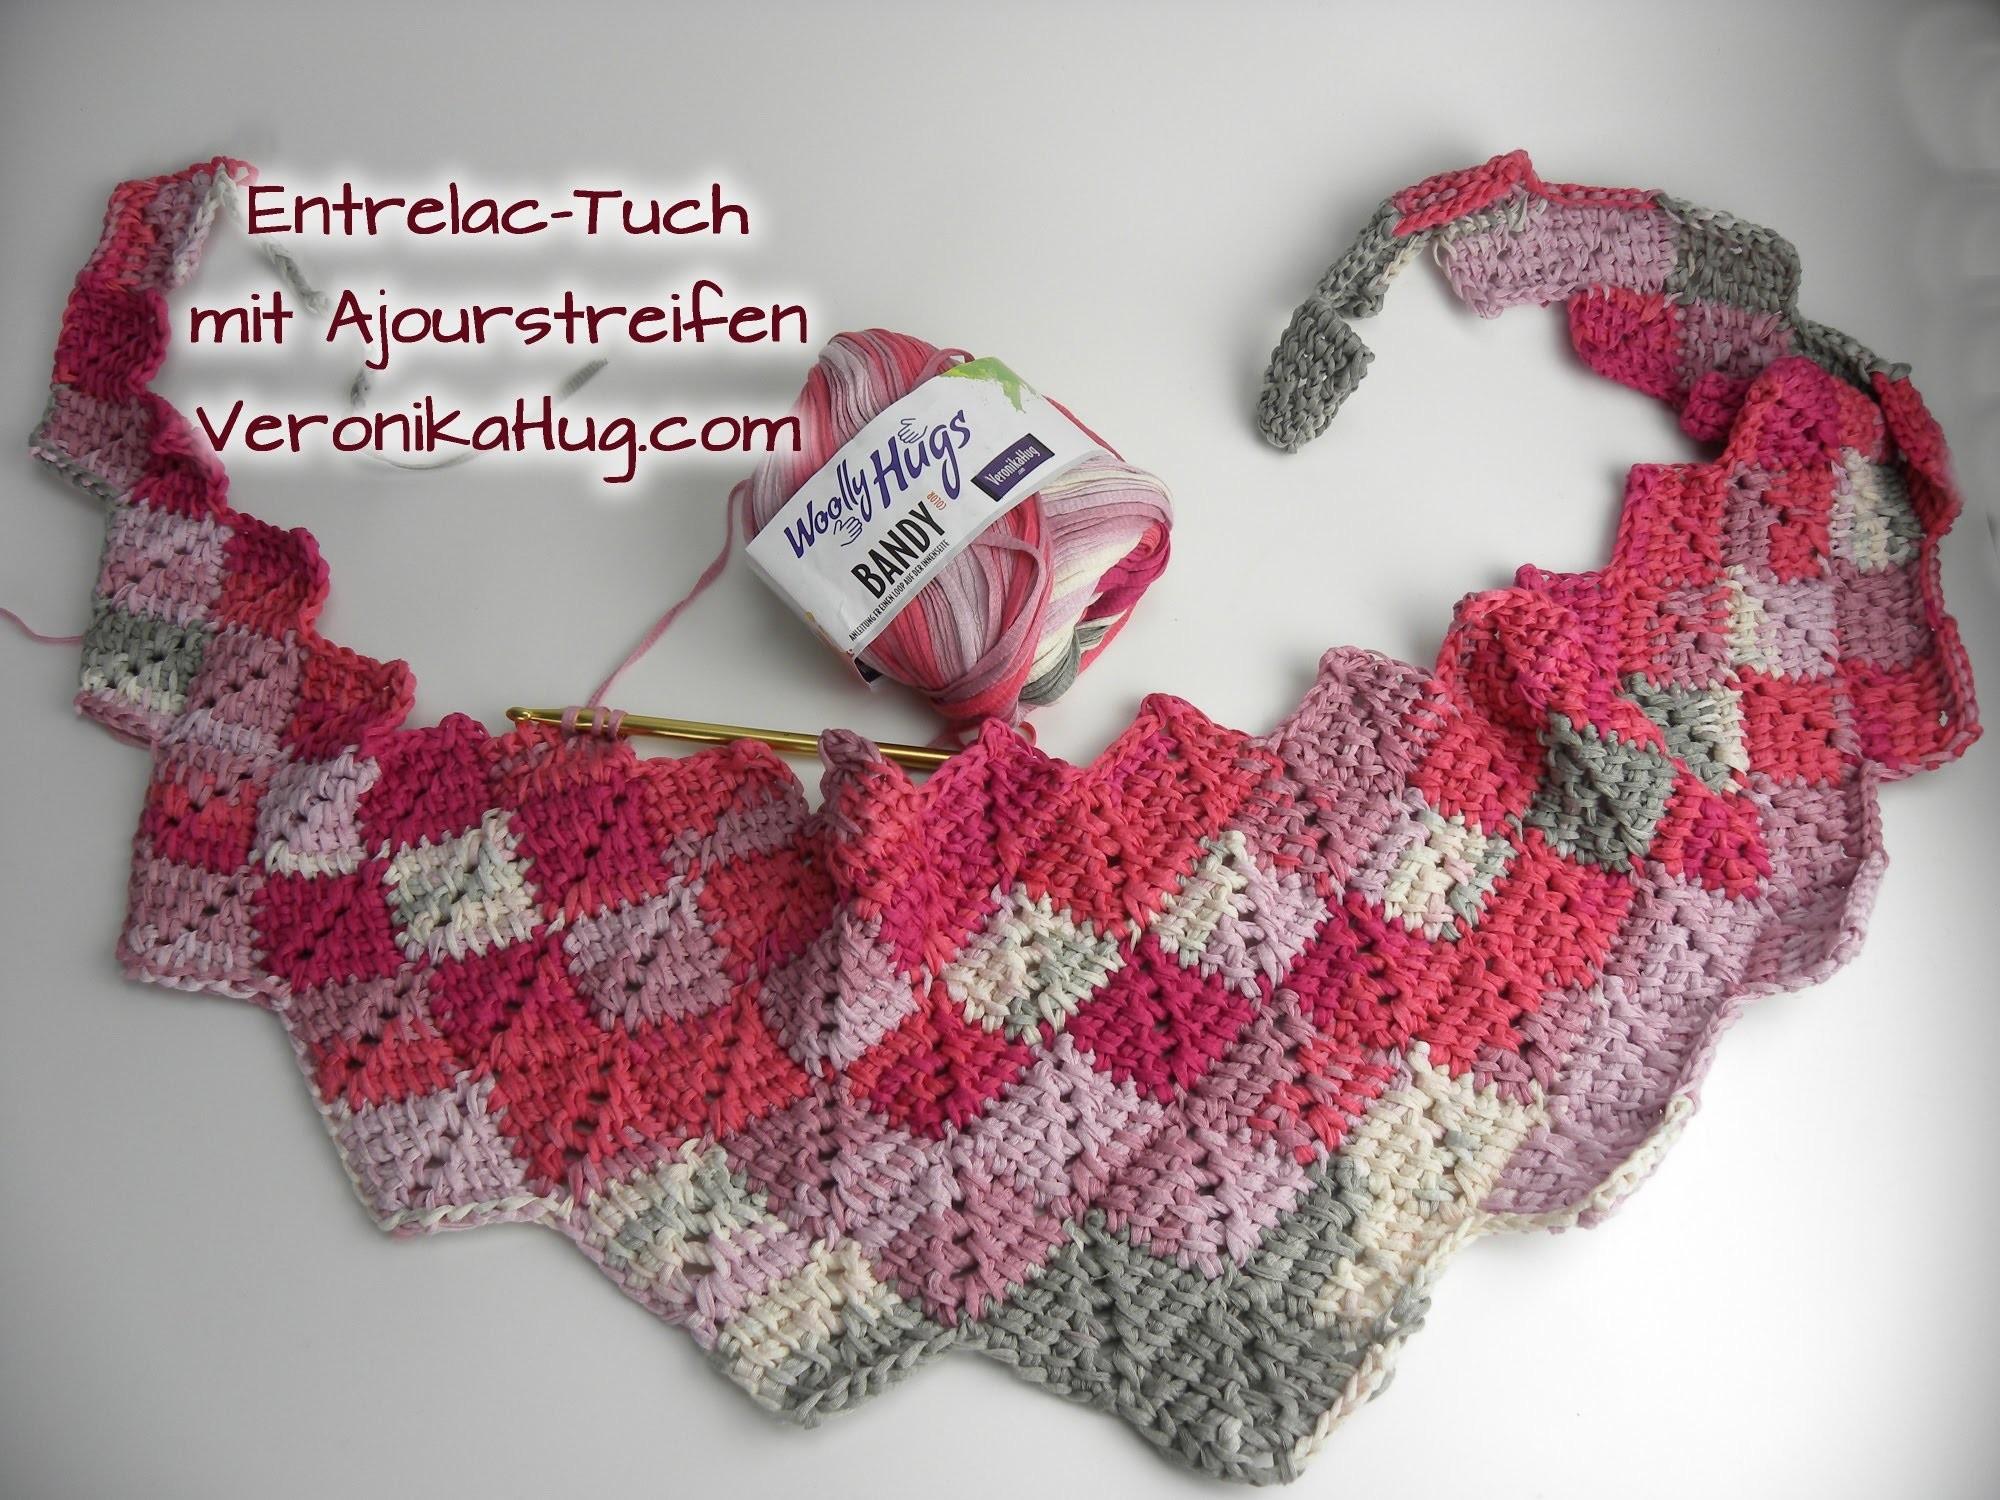 Häkeln Entrelac-Tuch -  Woolly Hugs BANDY Veronika Hug - Teil 1